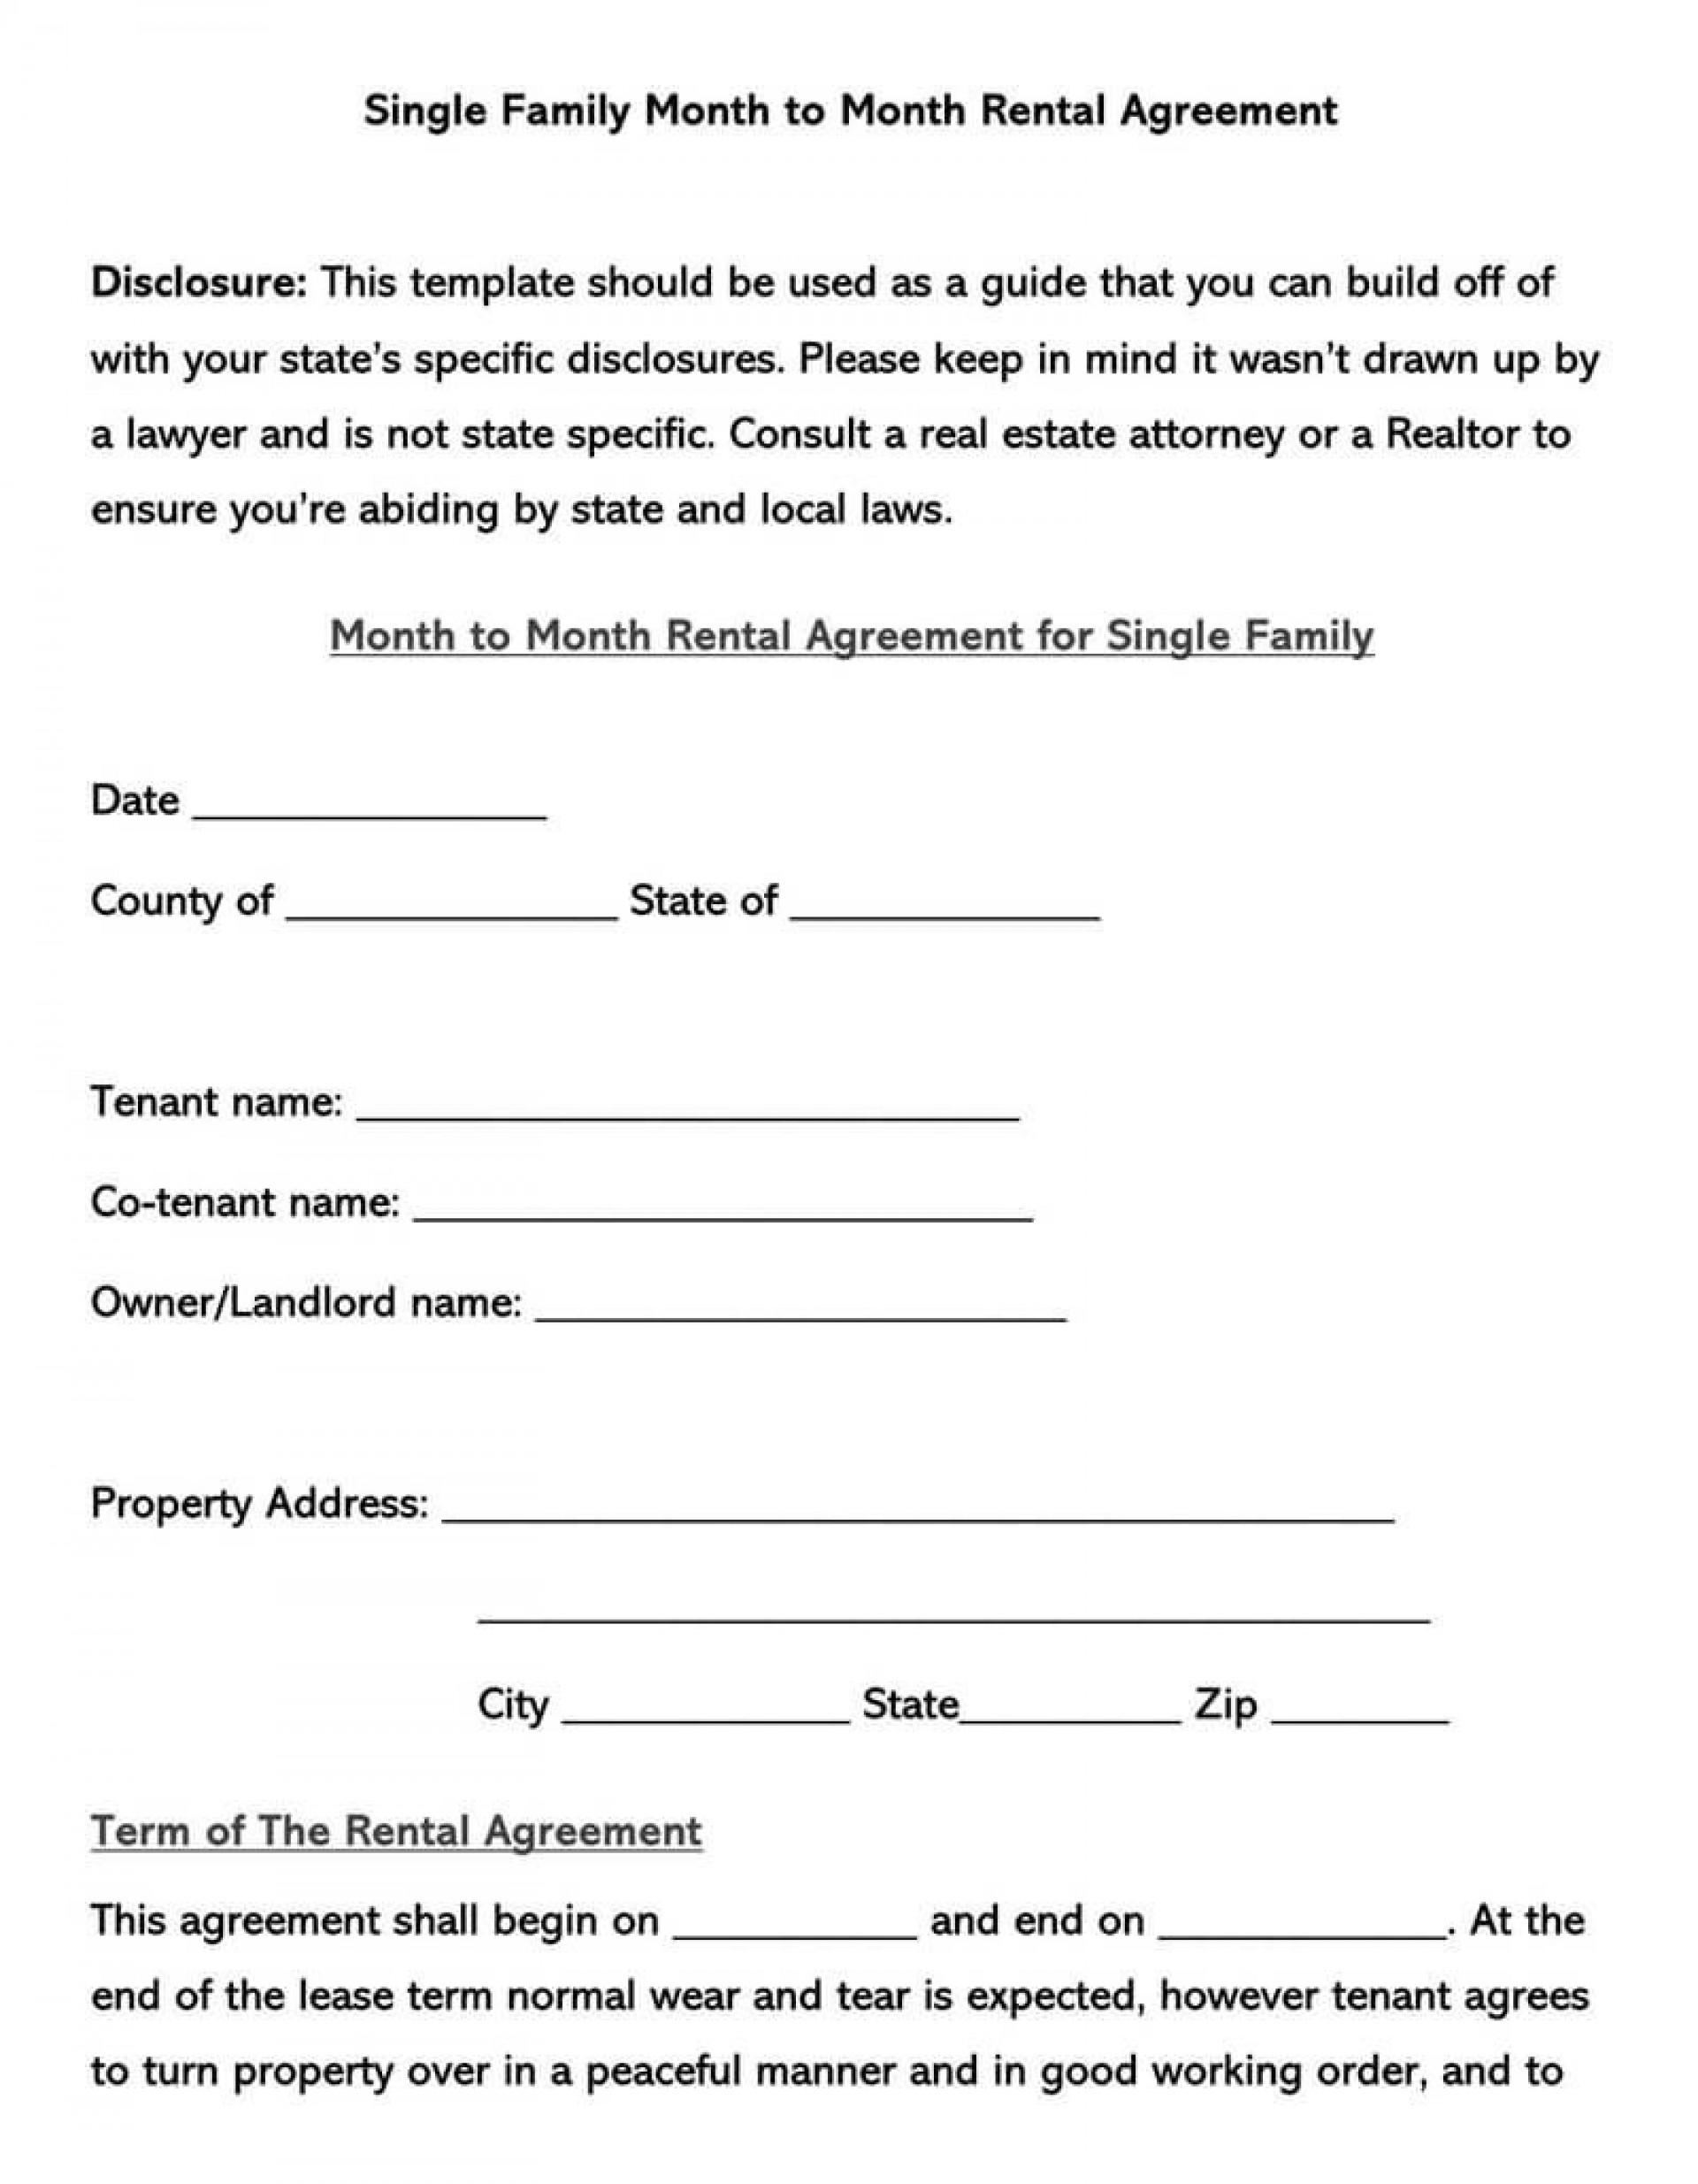 008 Impressive Rental Agreement Contract Free Download Design  Tenancy Form Uk House Equipment1920